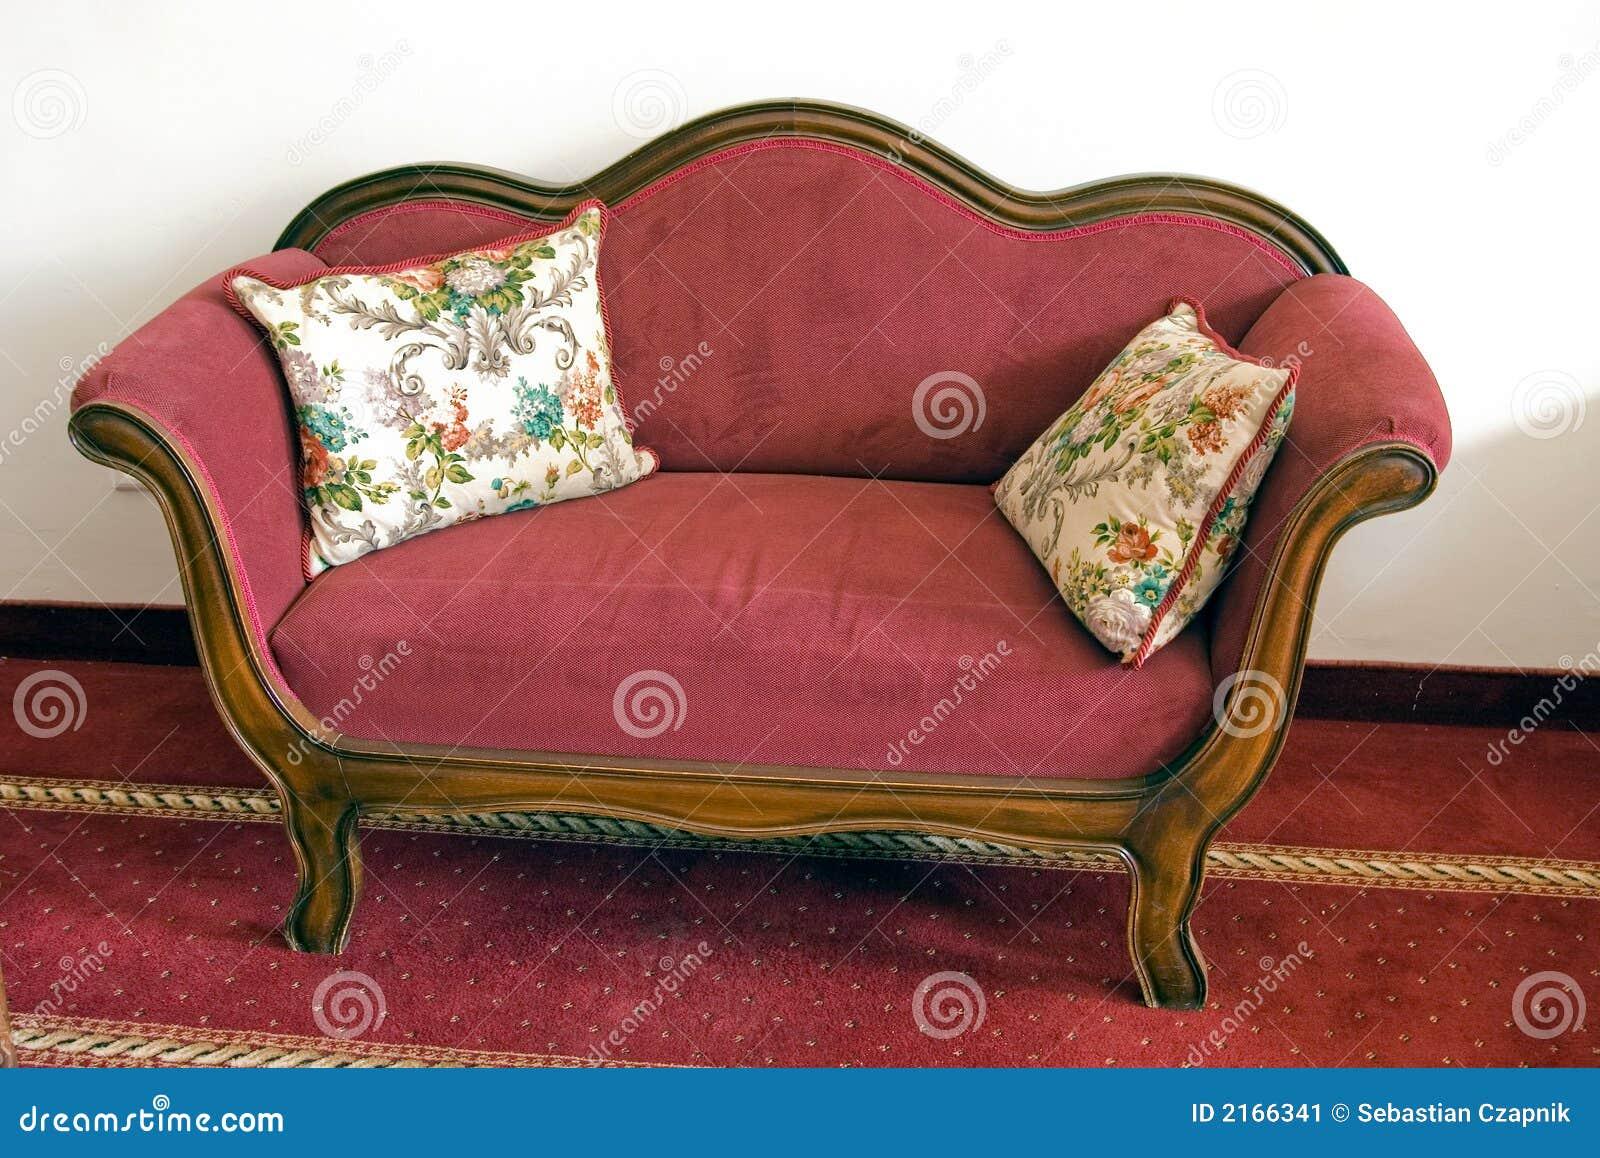 vintage red sofa - Vintage Sofa